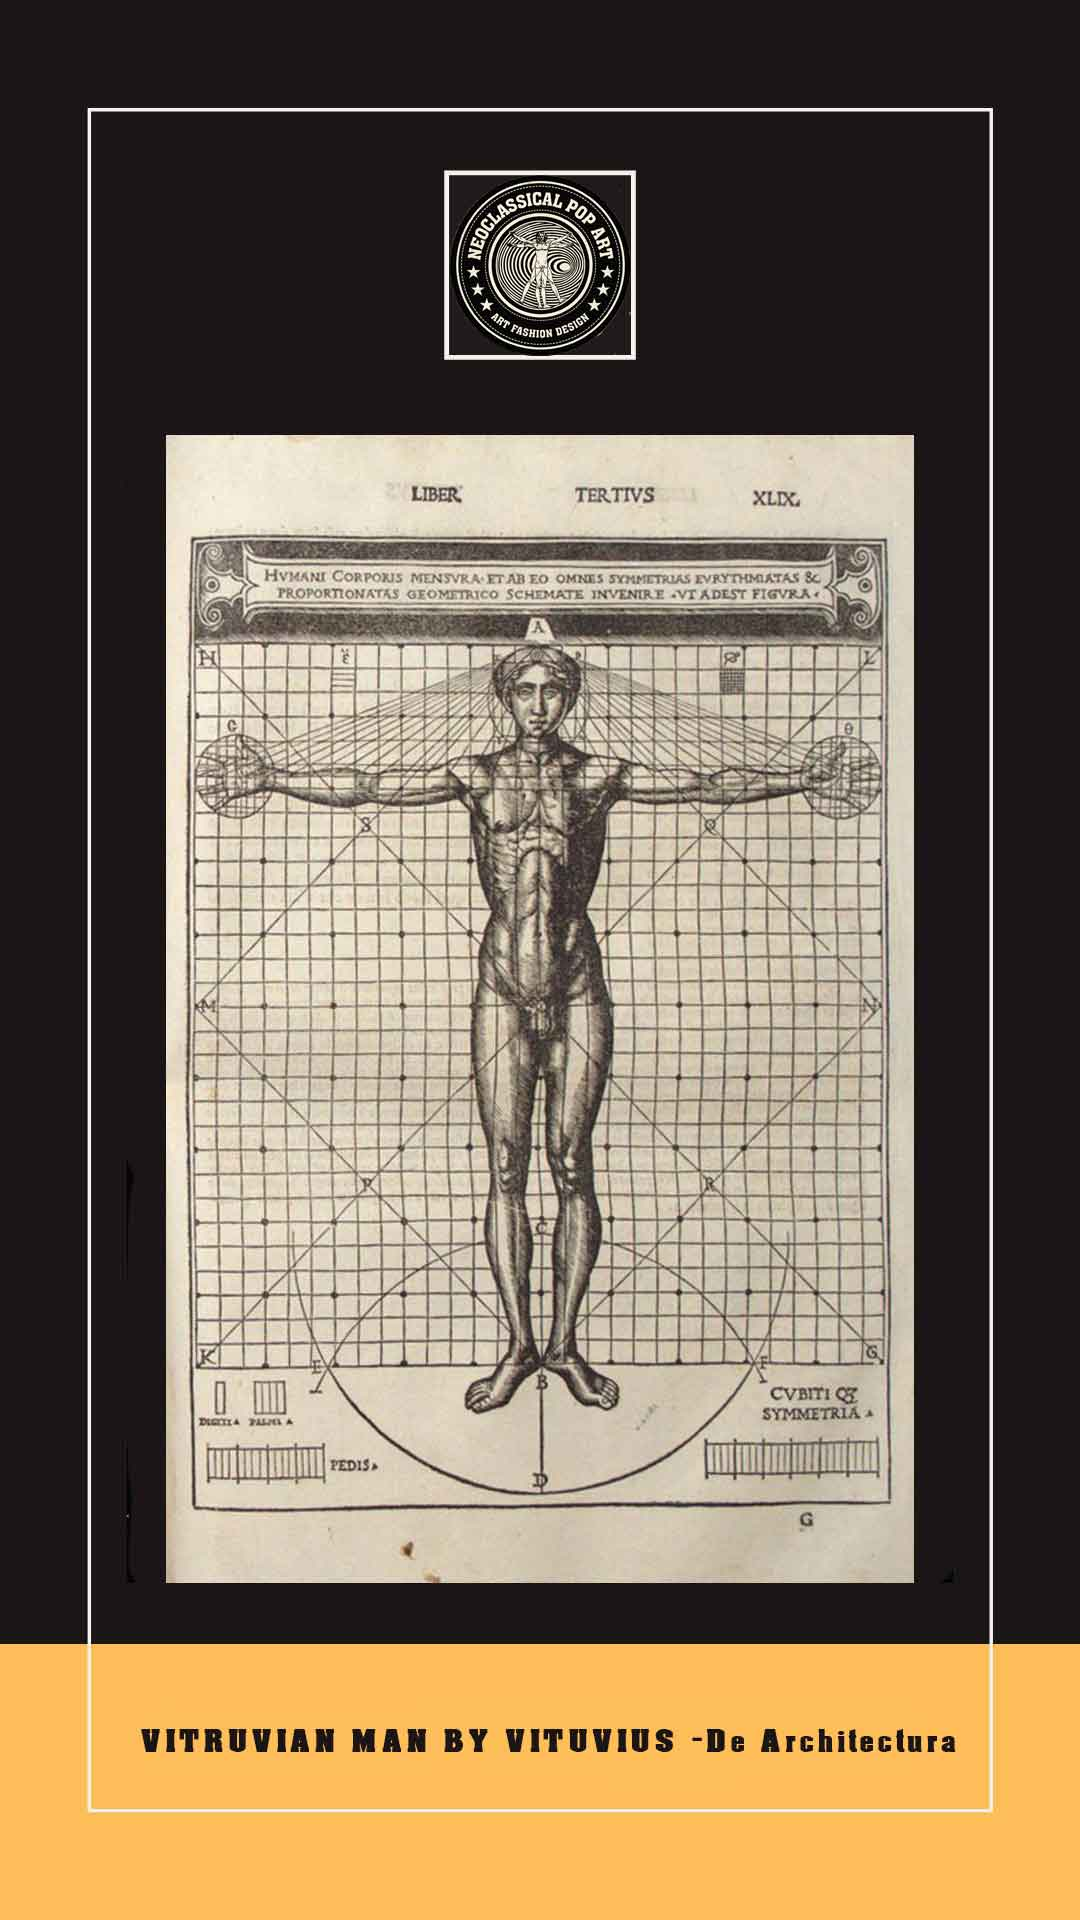 vitruvian man-drawing